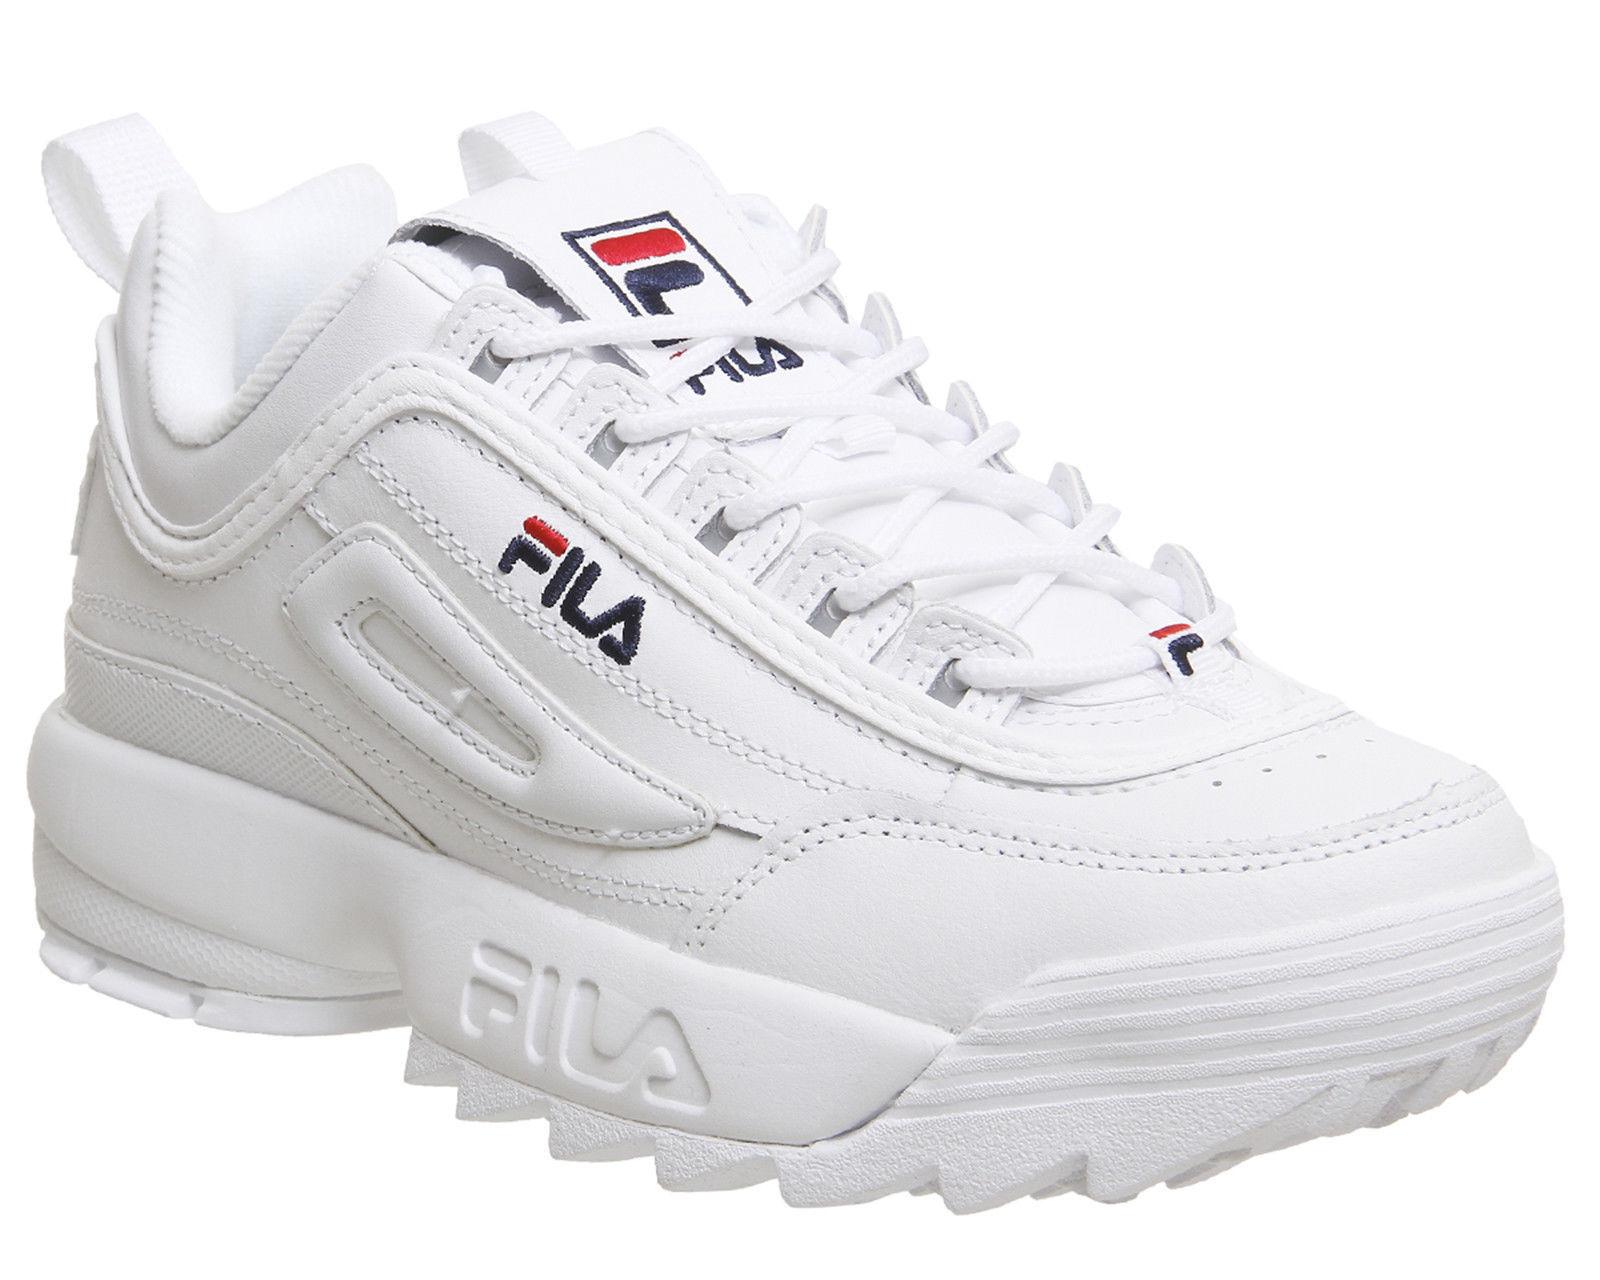 Unisex Originale FILA Disruptor II 2 White Authentic Shoes Size 35